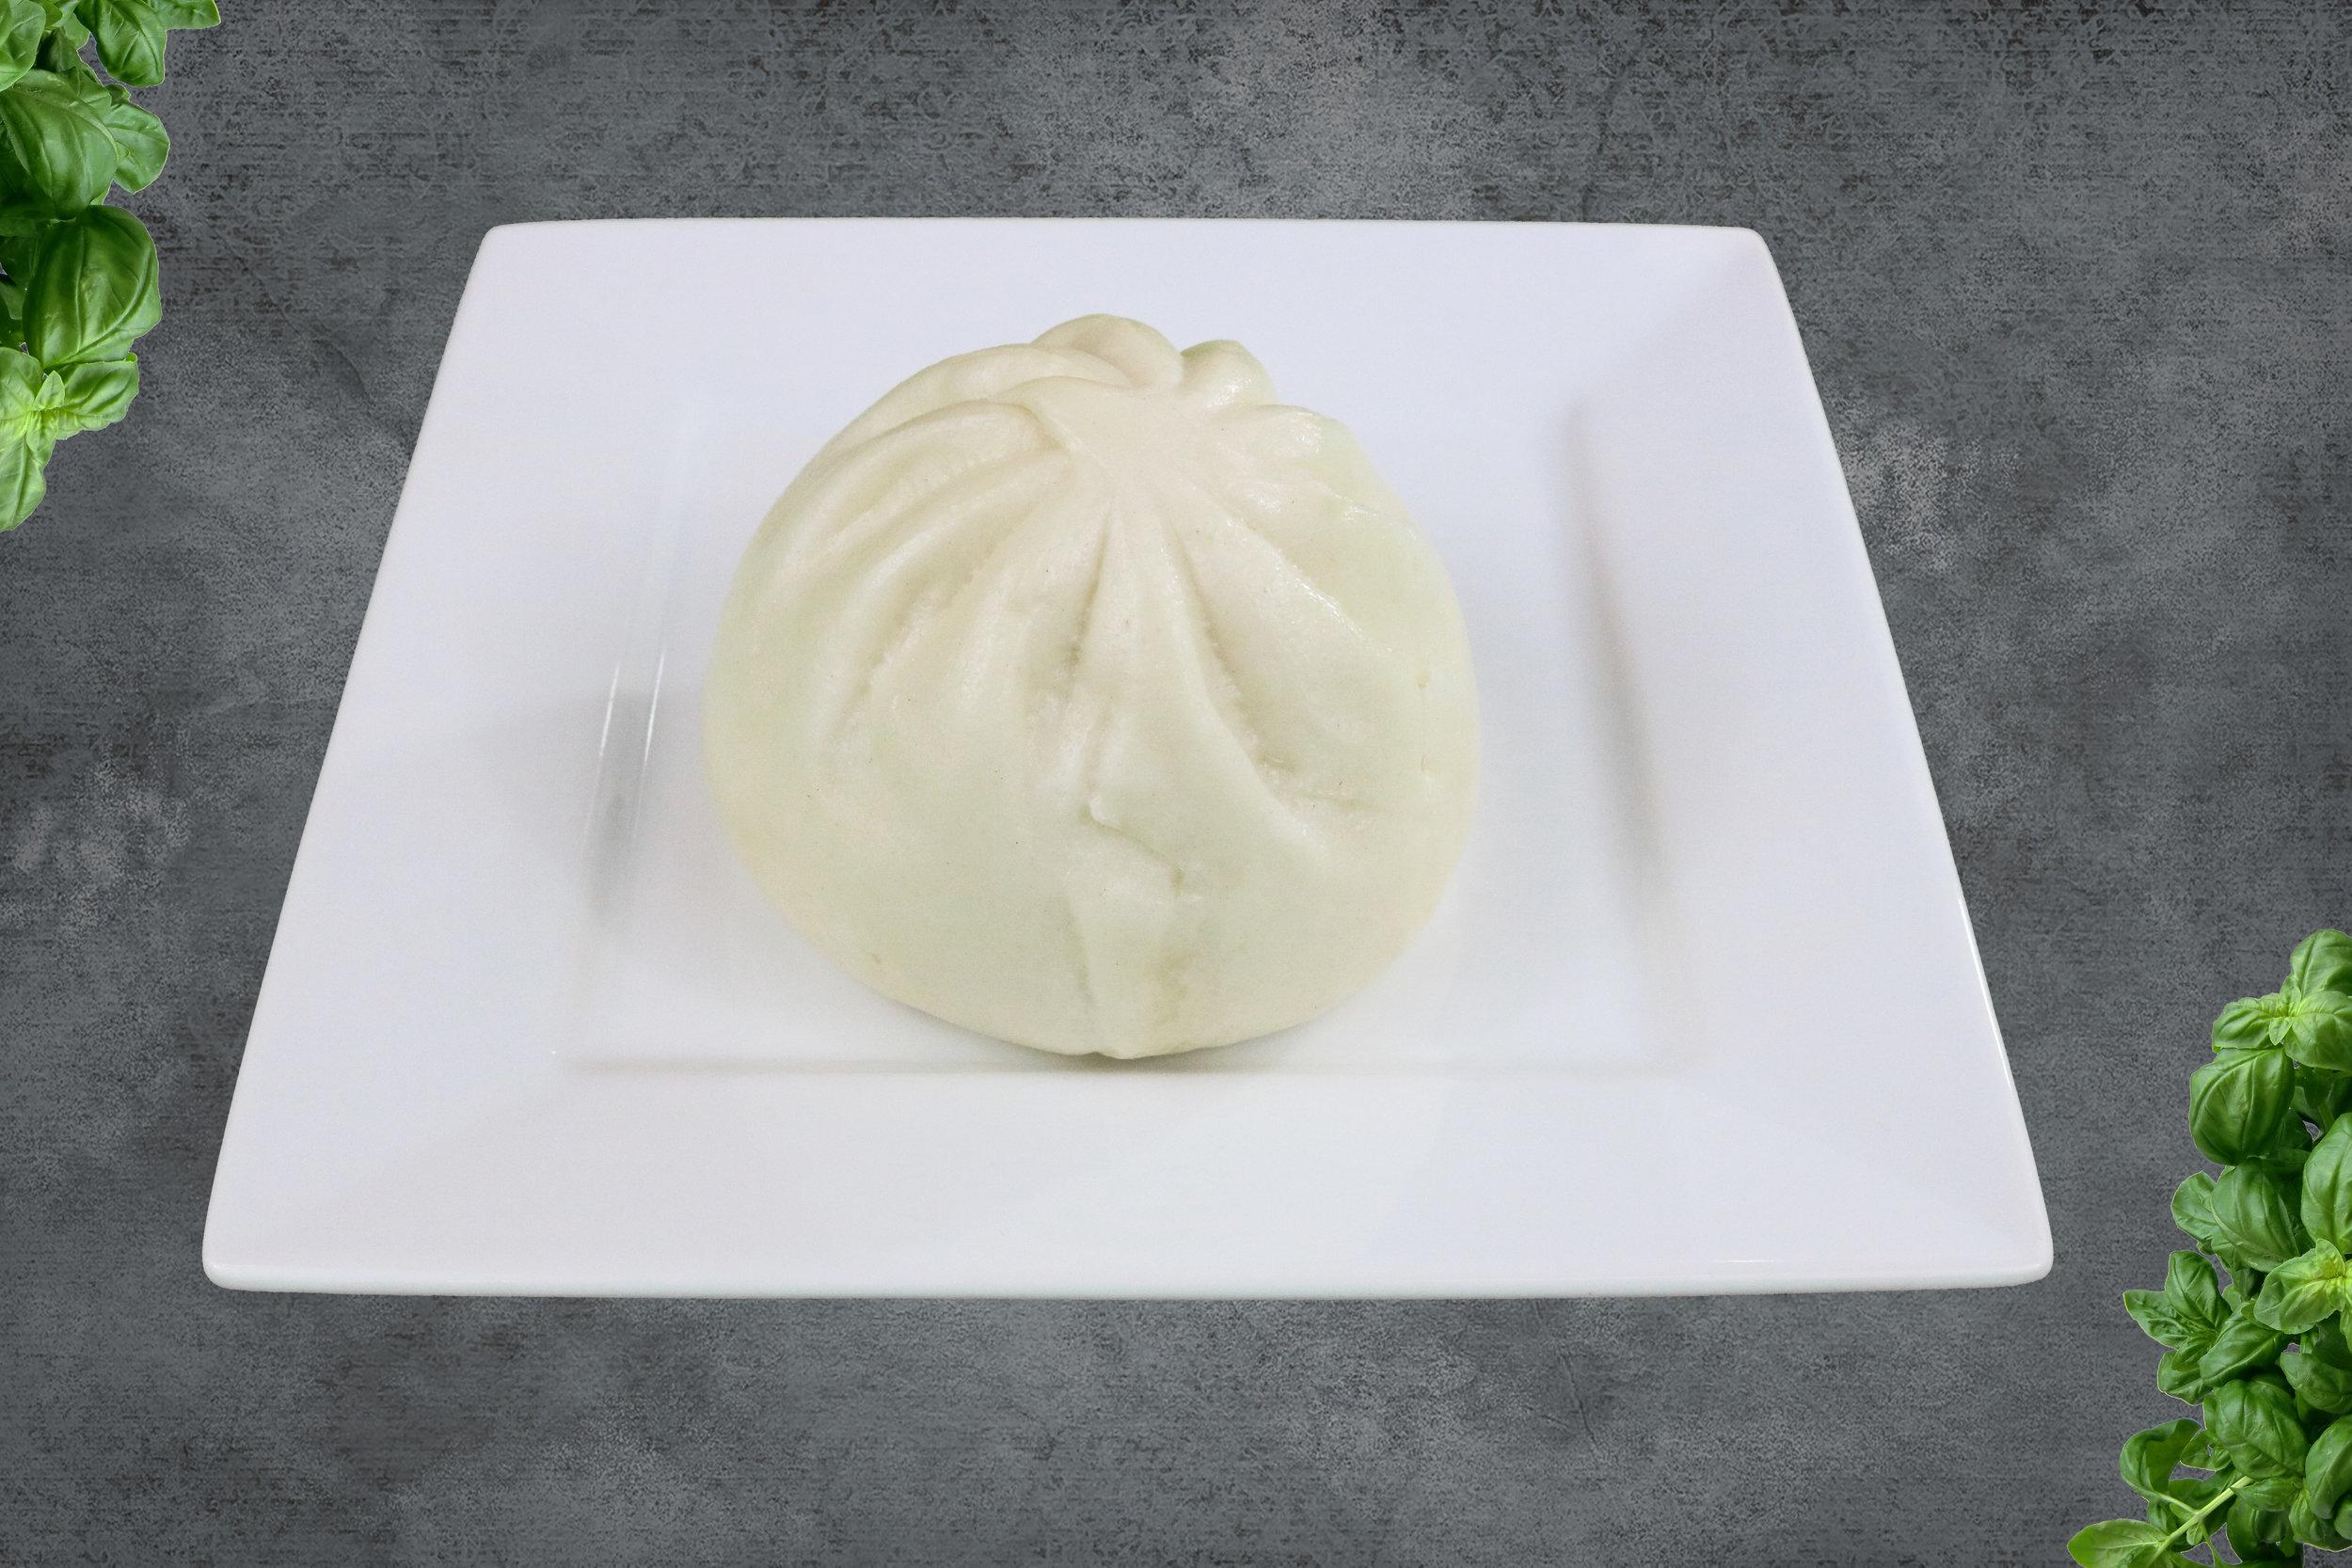 steamed_buns.jpg